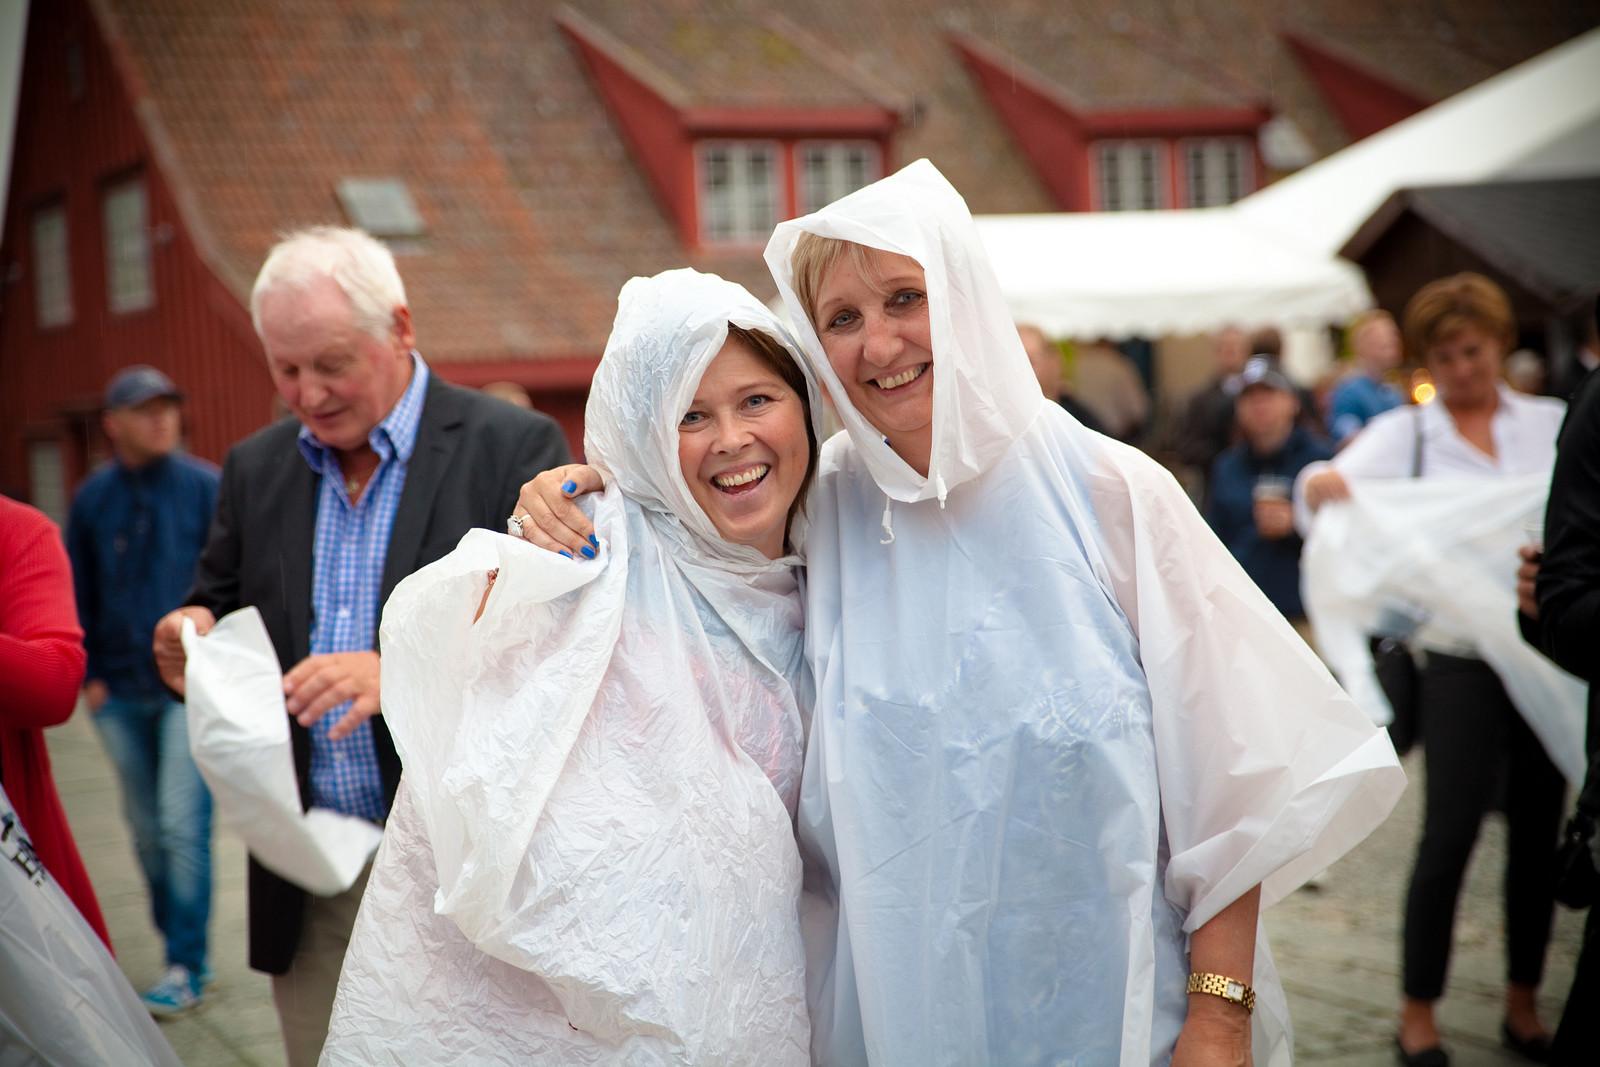 Olavsfestdagene // 2013